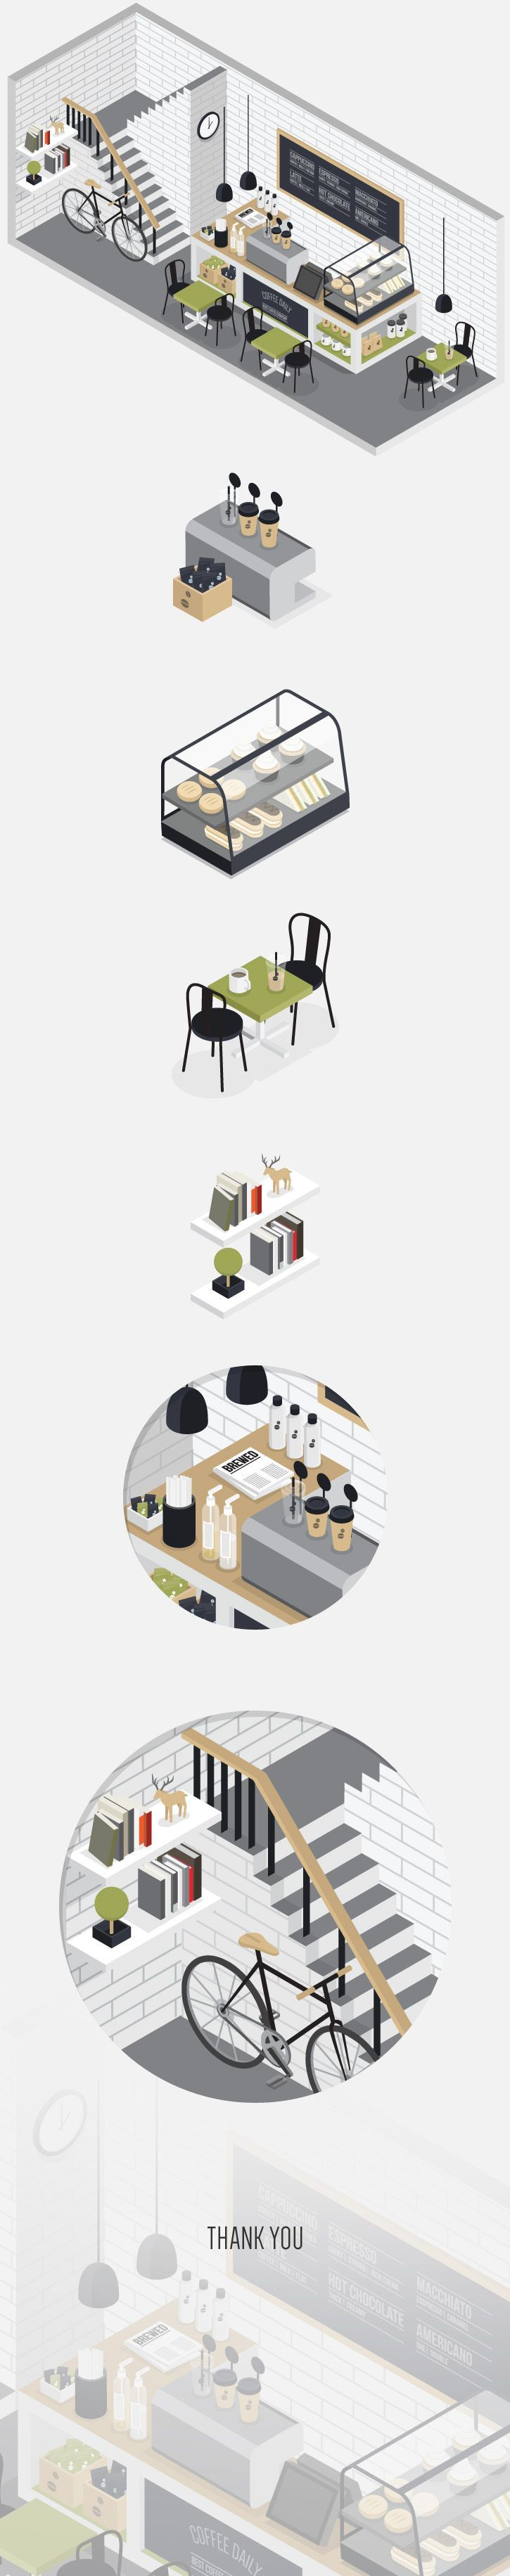 #flat #illustration https://m1.behance.net/profiles9/1129901/projects/13804137/301a5c3c960c66e3c22741cf79b4c9e2.jpg